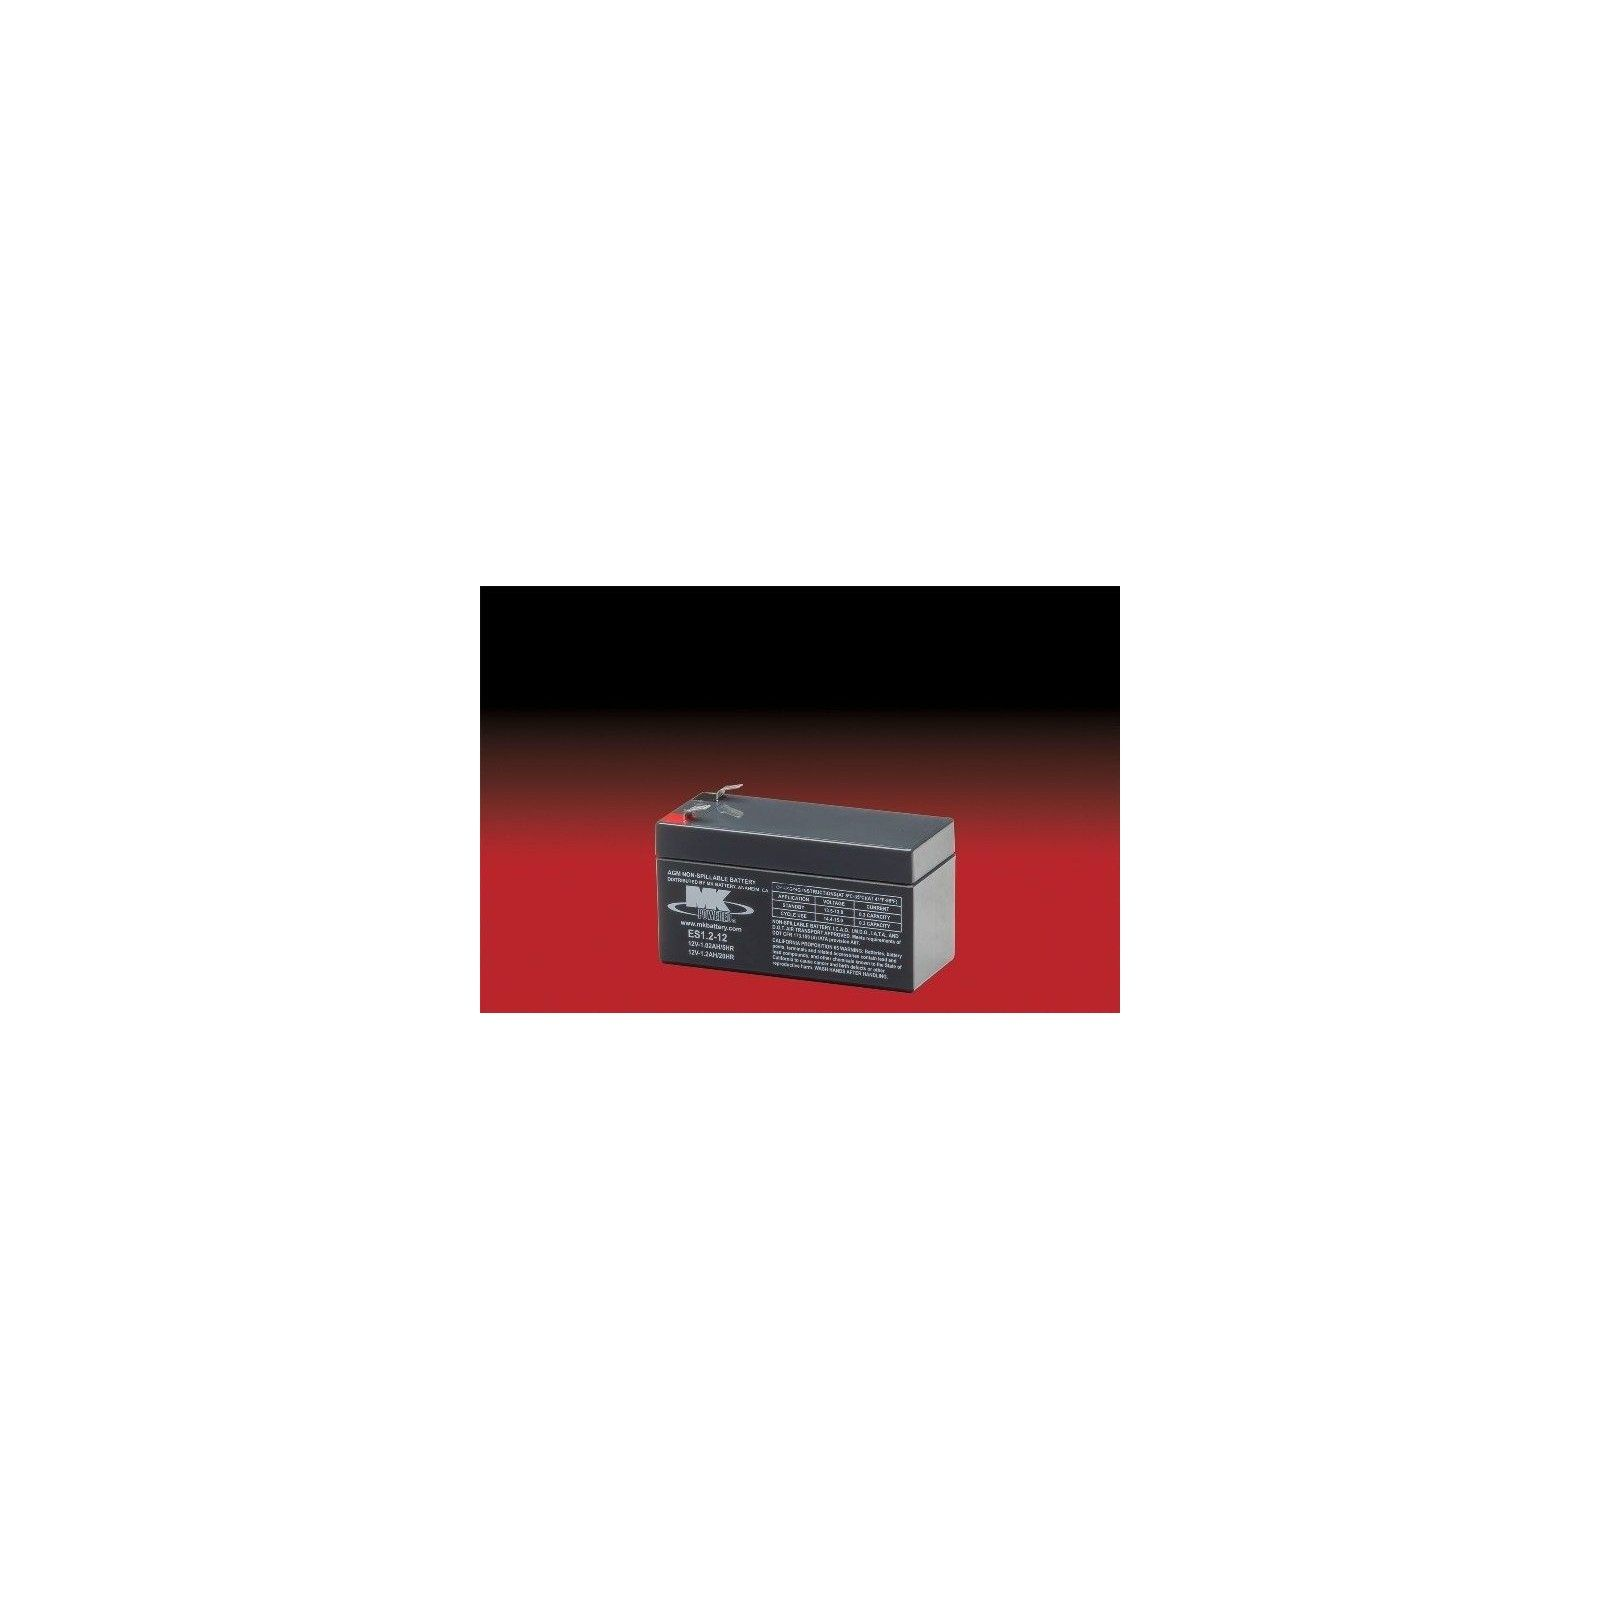 Batería MK ES1.2-12 1.2Ah 12V Agm MK - 1